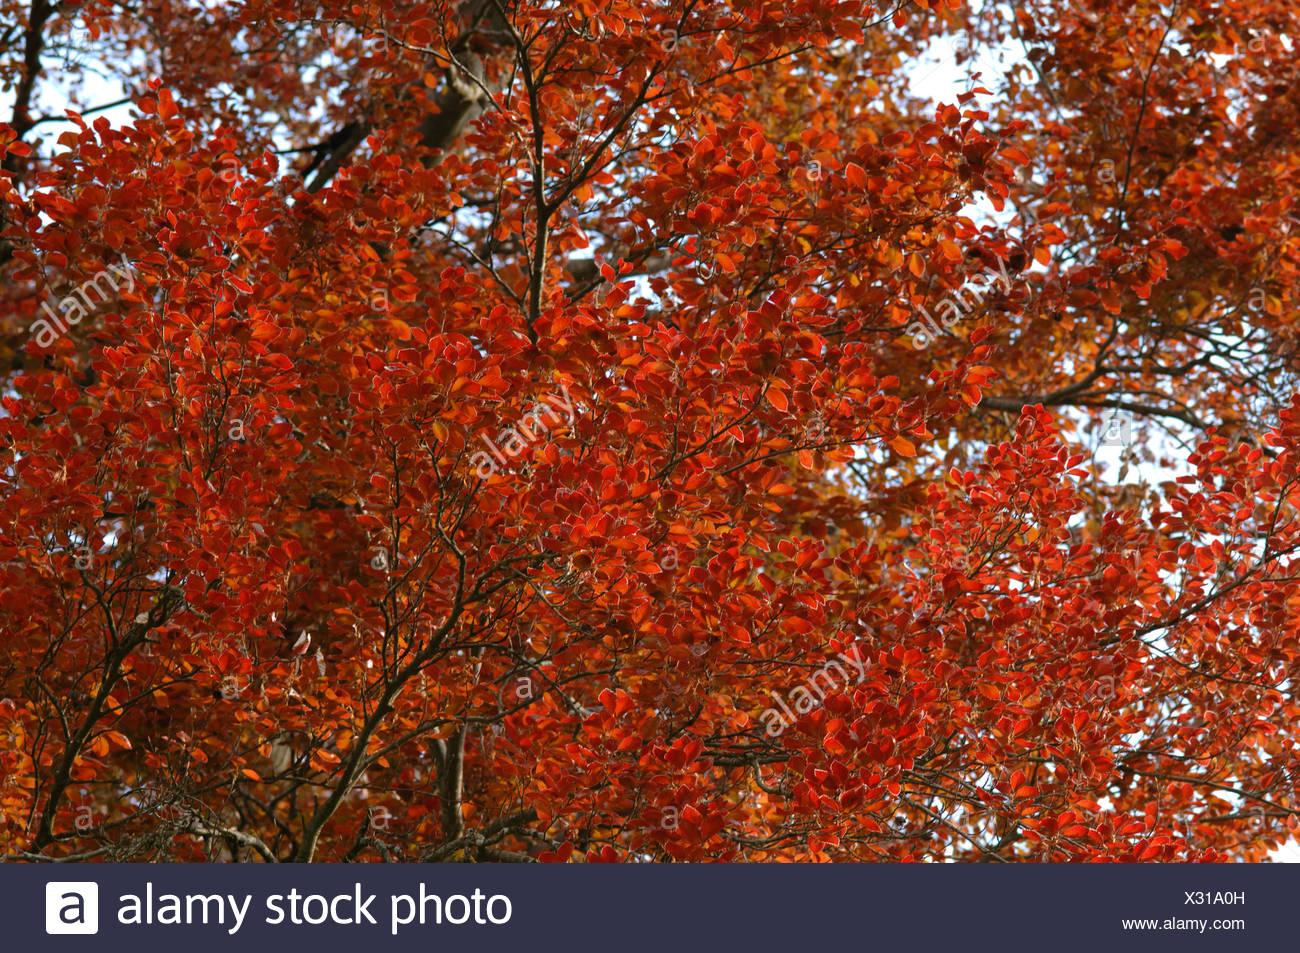 copper beech (Fagus sylvatica var. purpurea, Fagus sylvatica 'Atropunicea', Fagus sylvatica Atropunicea), shooting of teh leaves, Germany - Stock Image